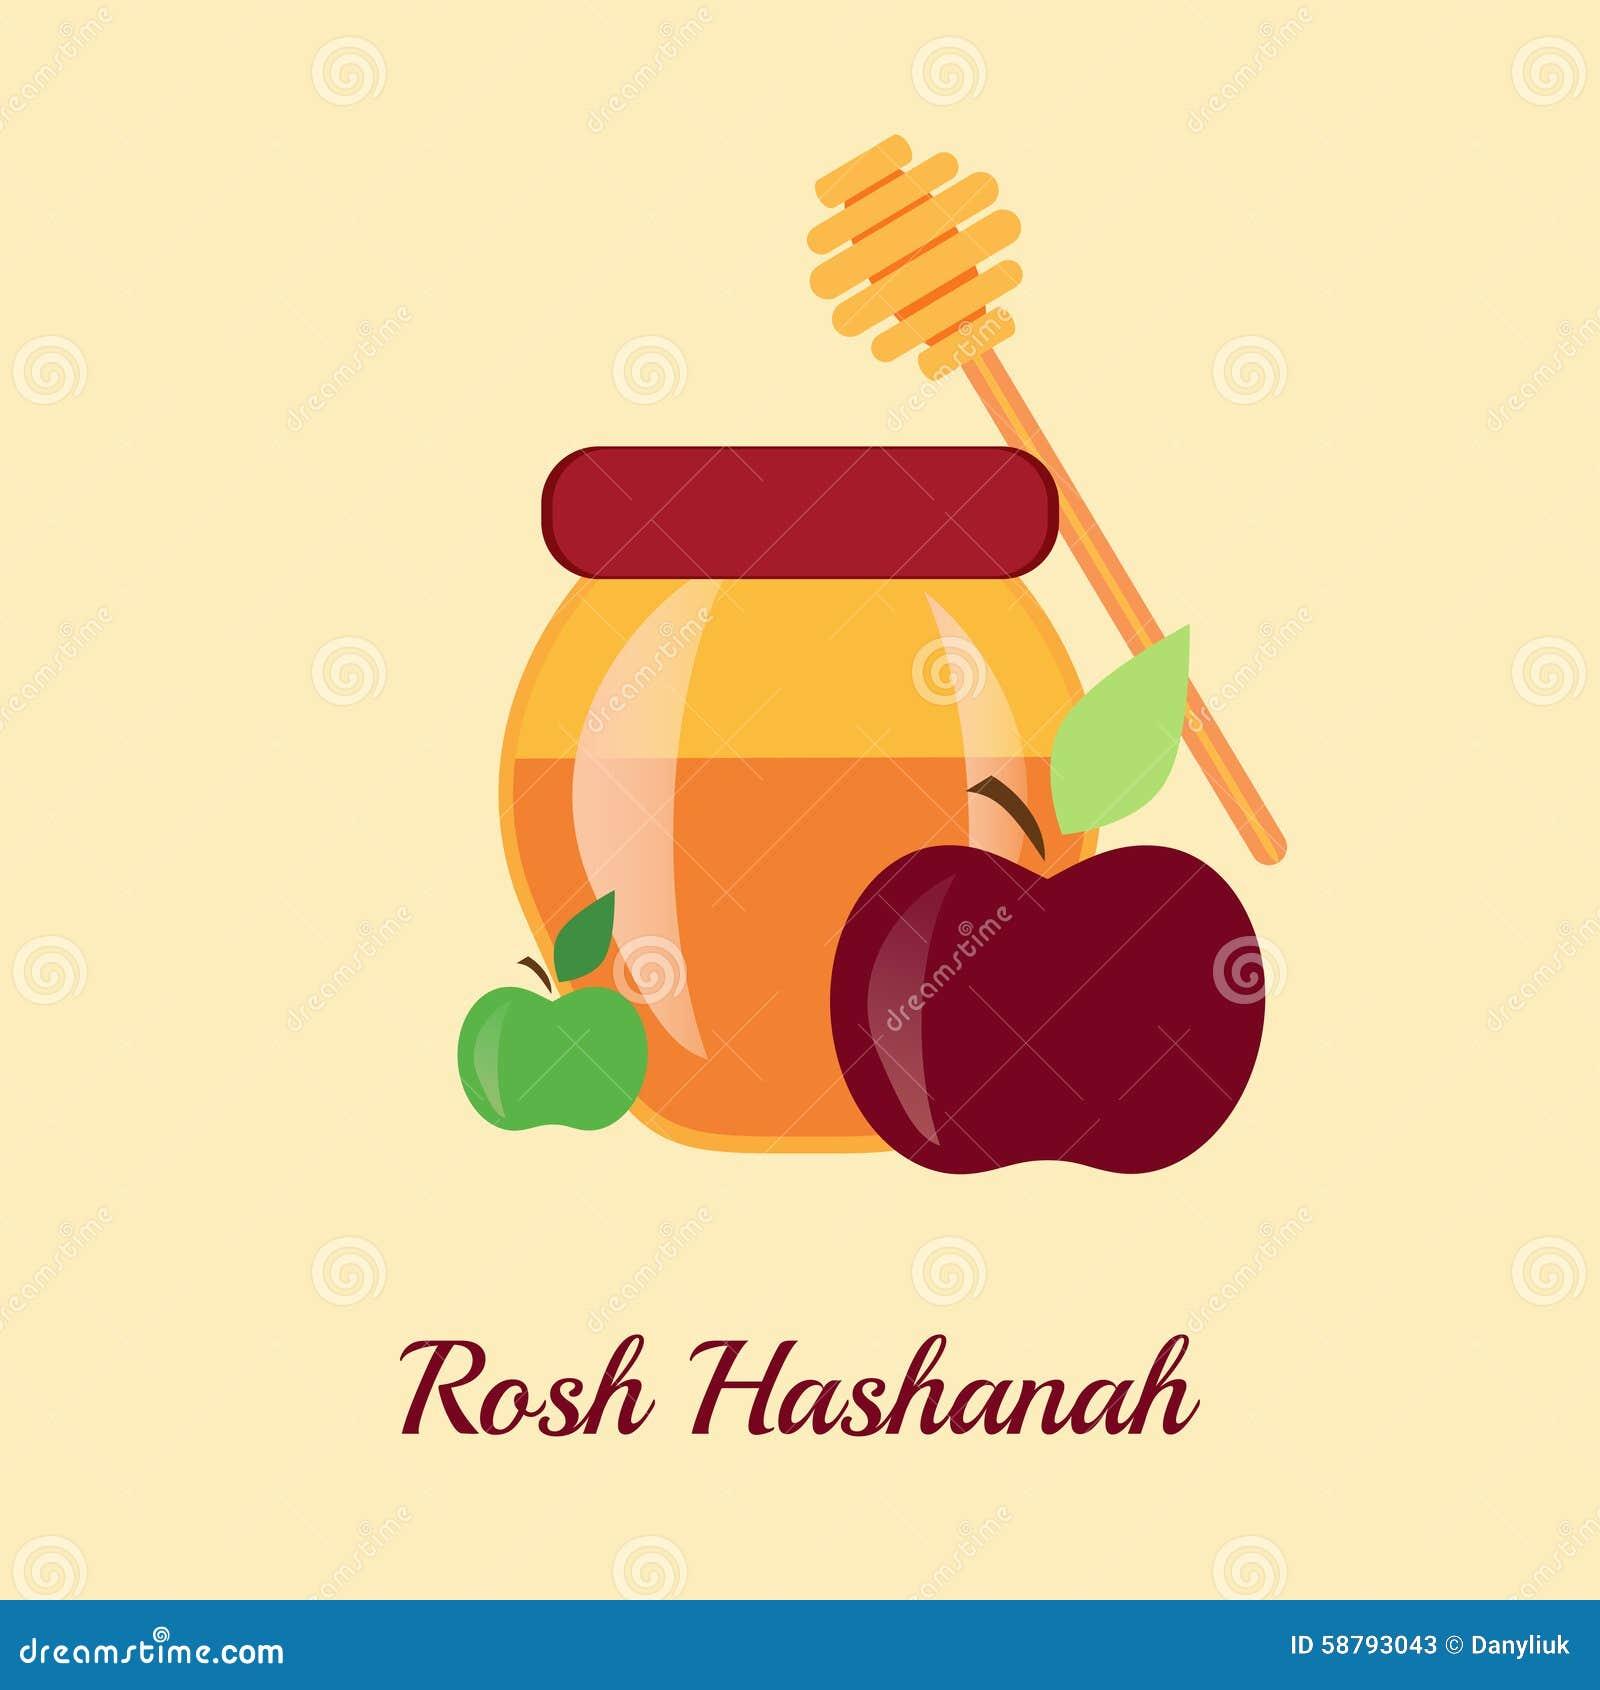 Greeting card design for jewish new year rosh hashanah stock royalty free illustration download greeting card design for jewish new year rosh hashanah stock illustration illustration m4hsunfo